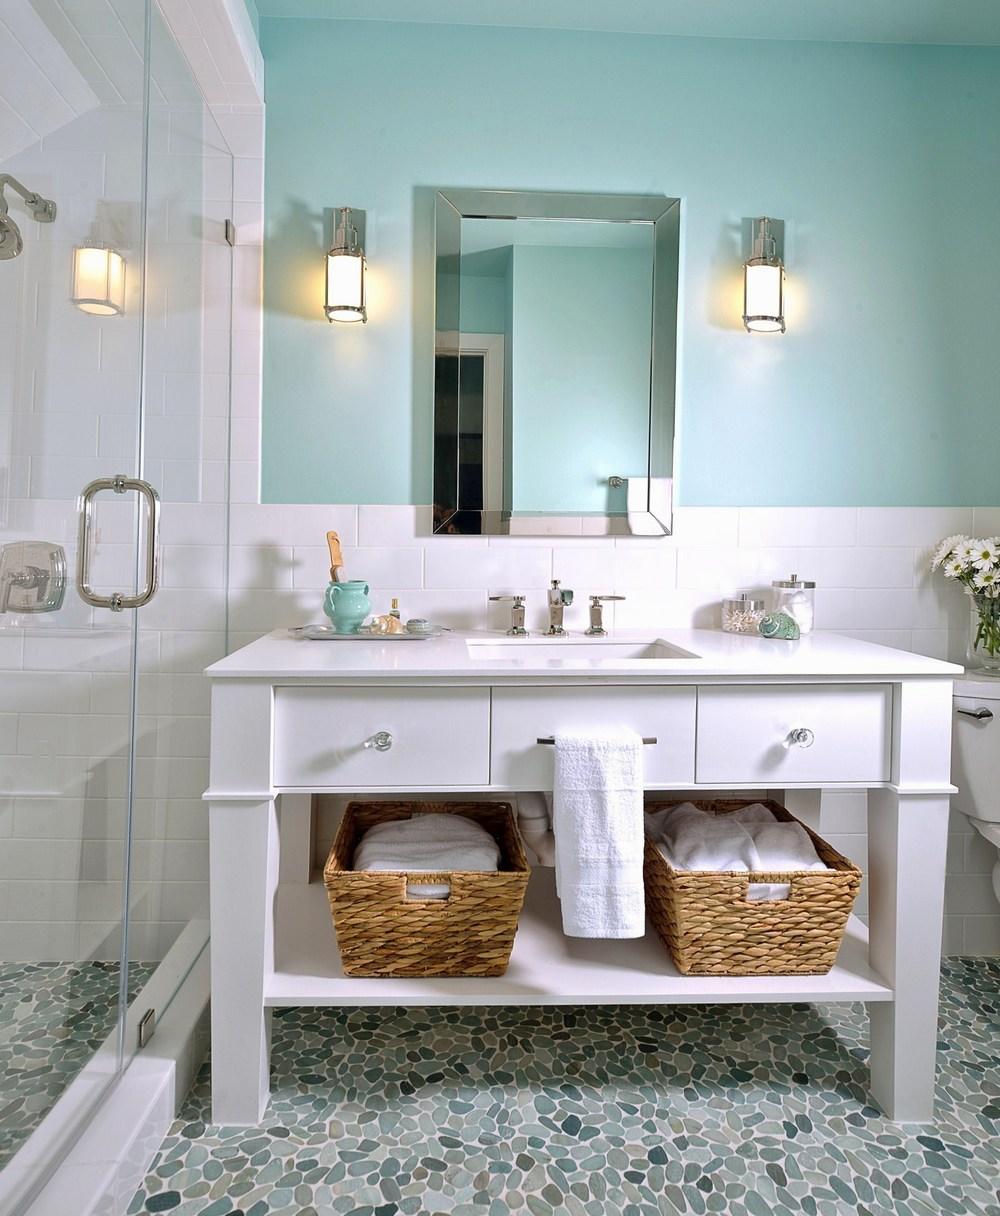 Custom designed vanity | Designer: Carla Aston